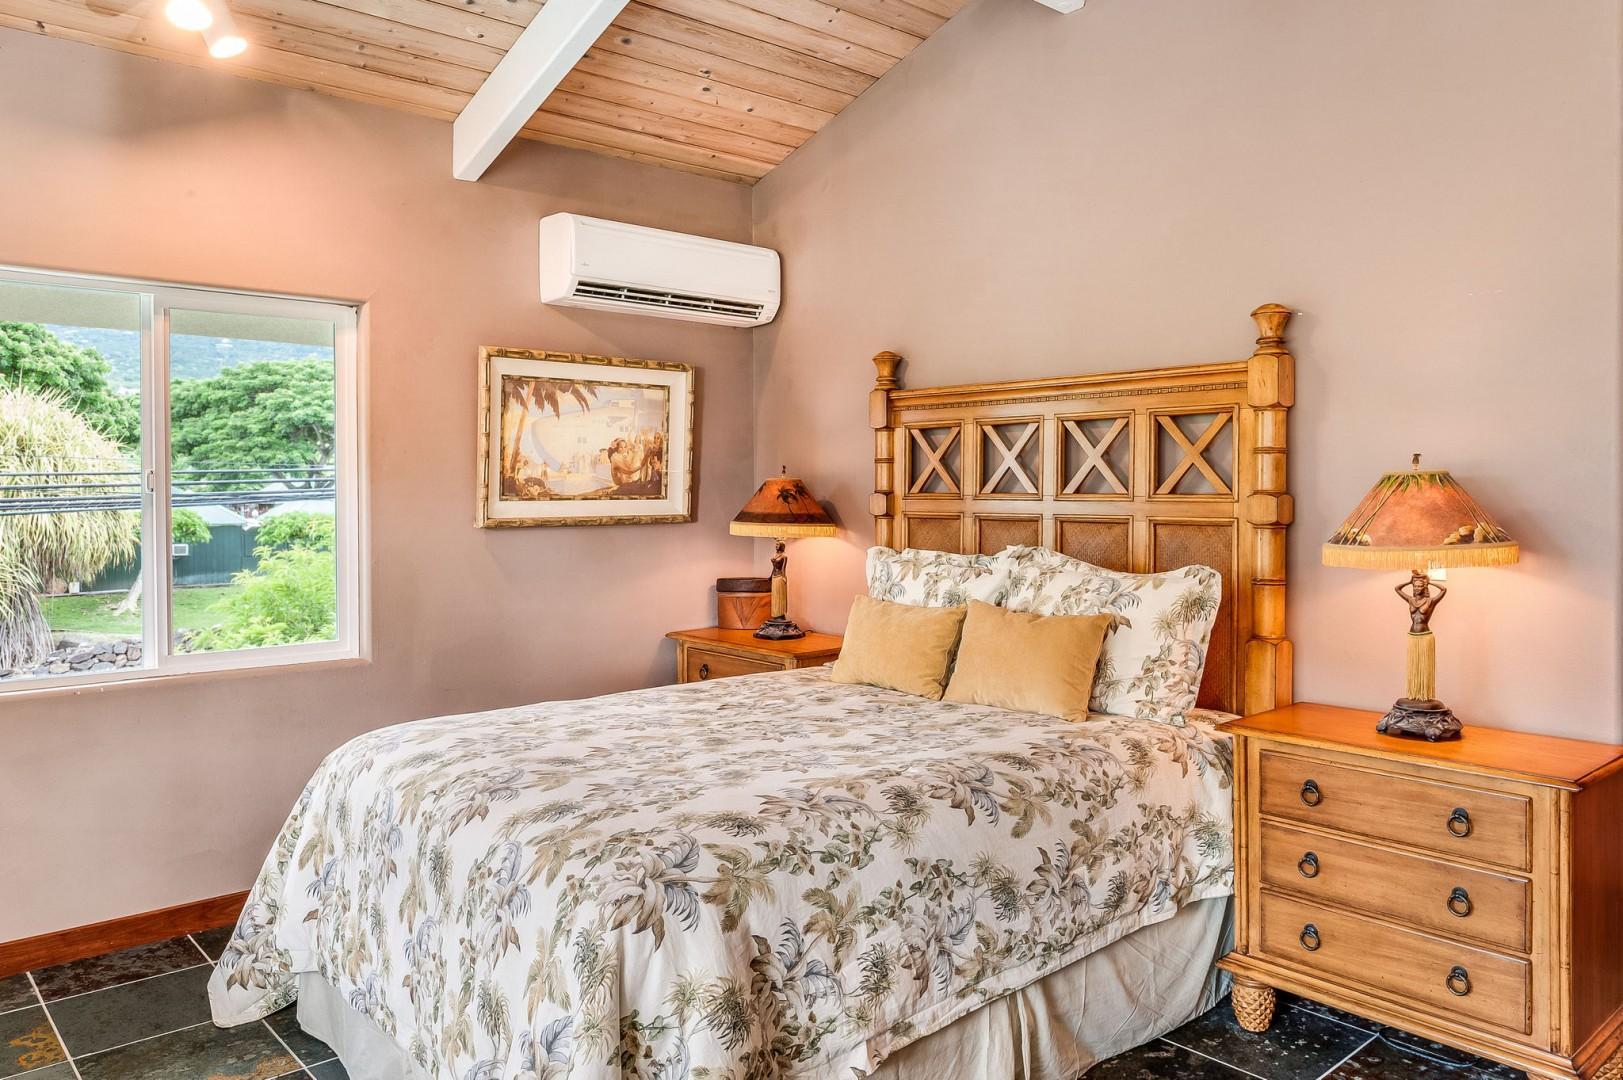 Hale Hoku sleeping quarters with Queen bed